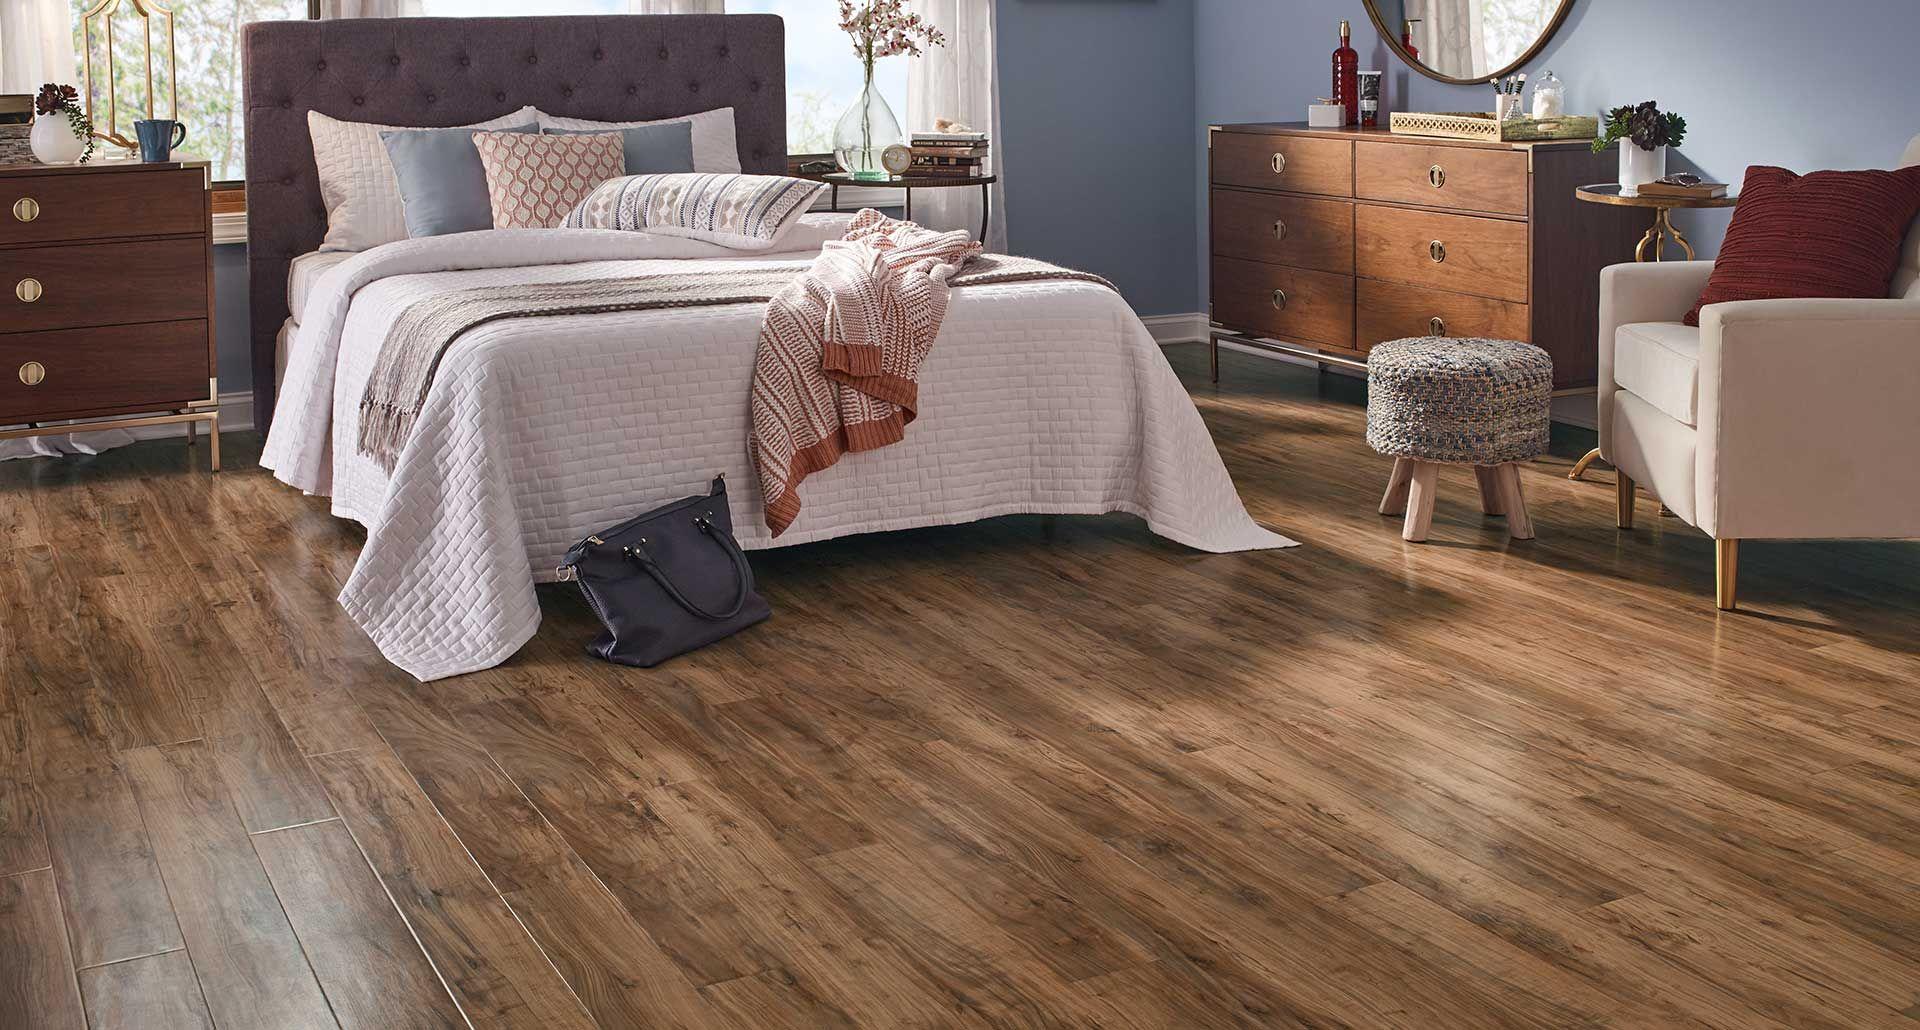 Apple Wood Smooth Laminate Floor Caramel Color Finish 10mm 1